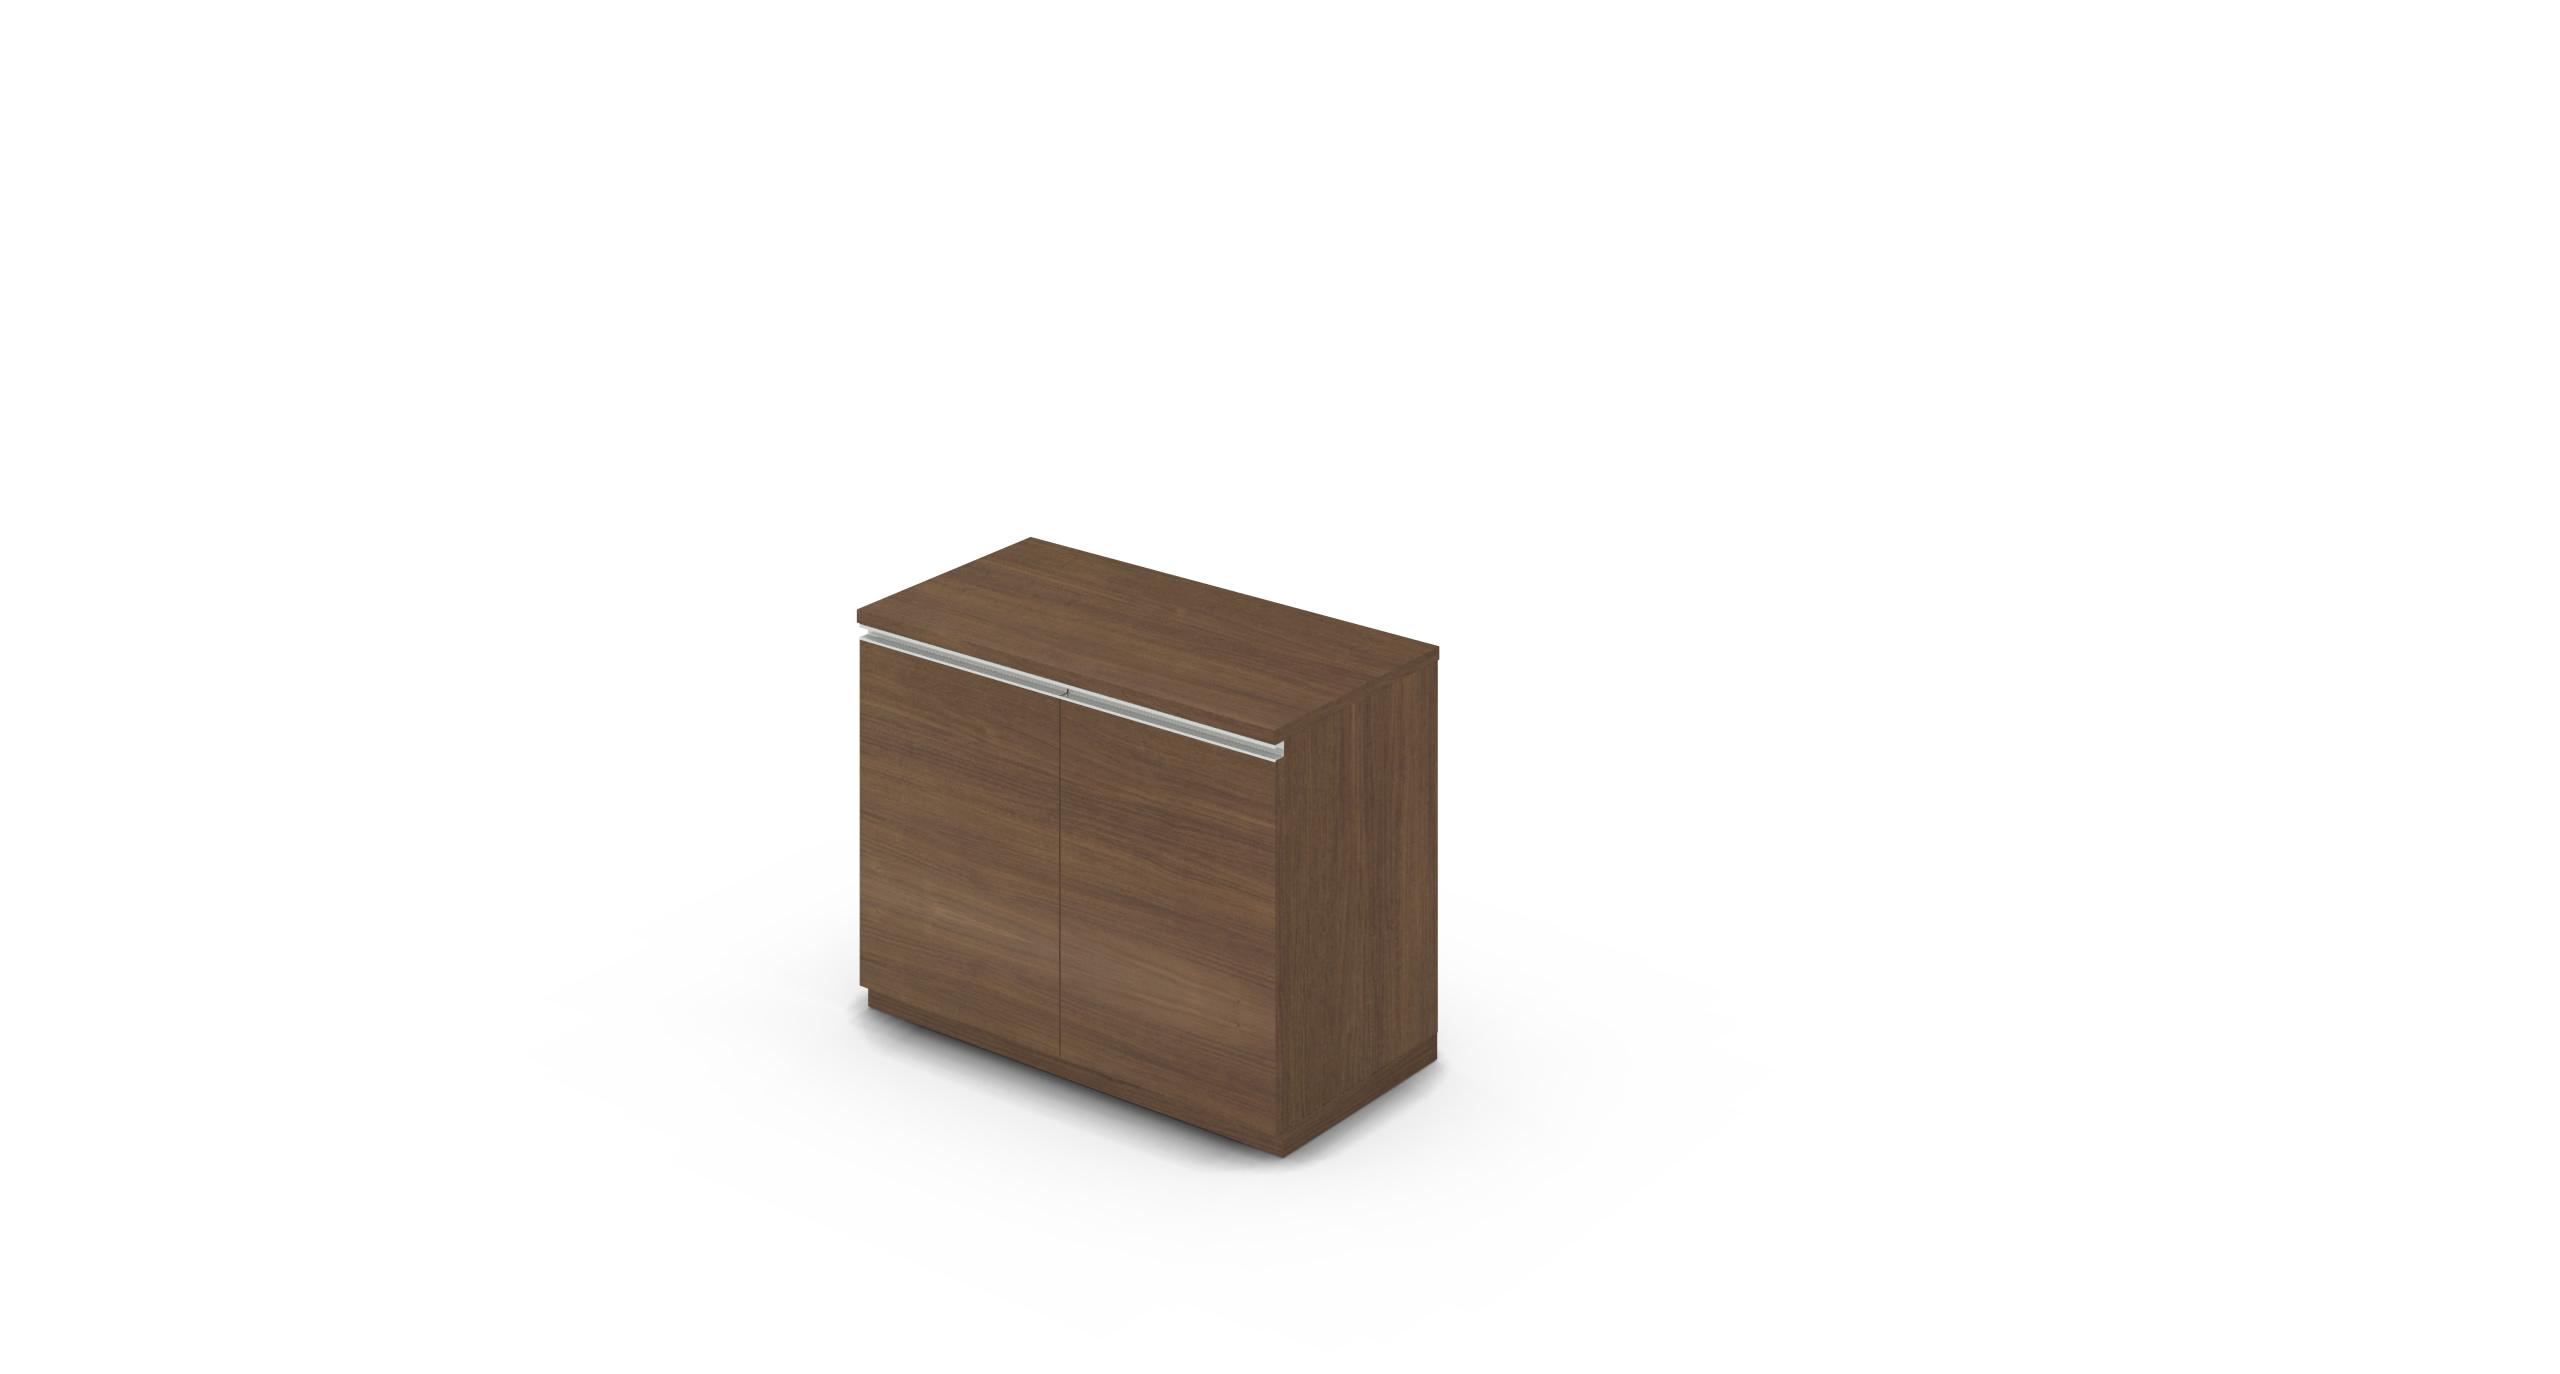 Cabinet_900x450x775_HD_Walnut_Rail_NoCylinder